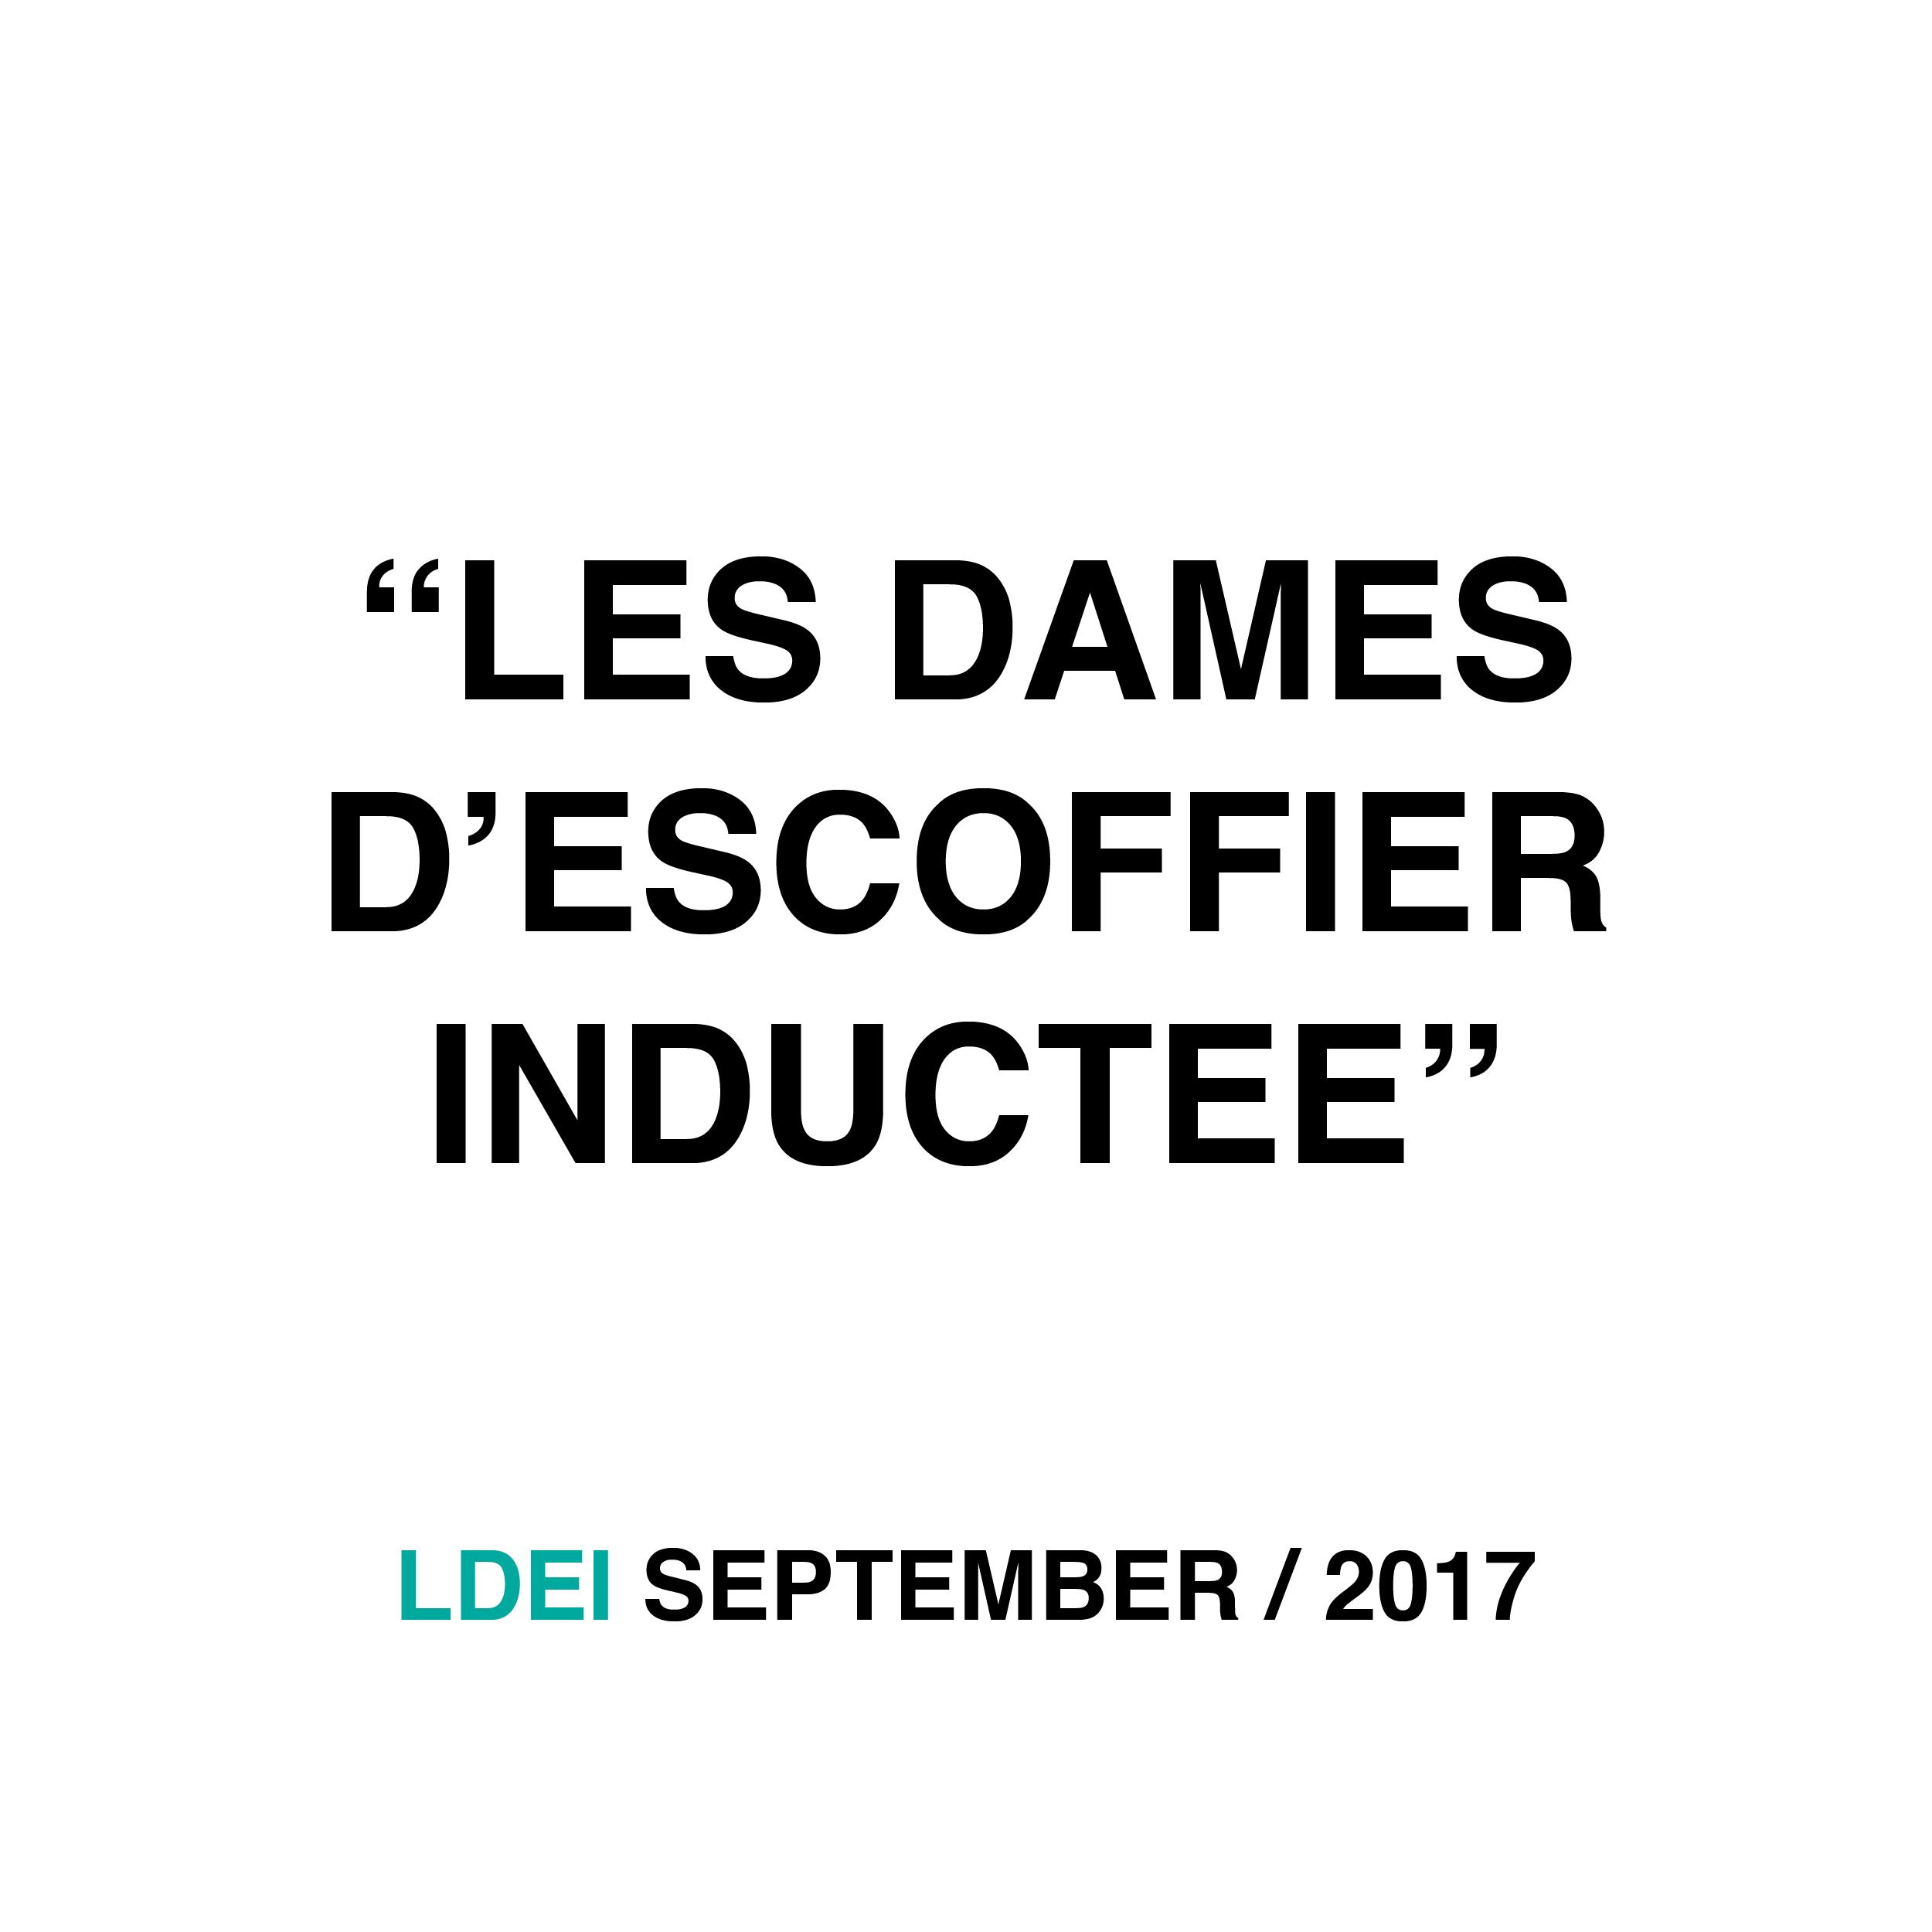 ledames-01.png